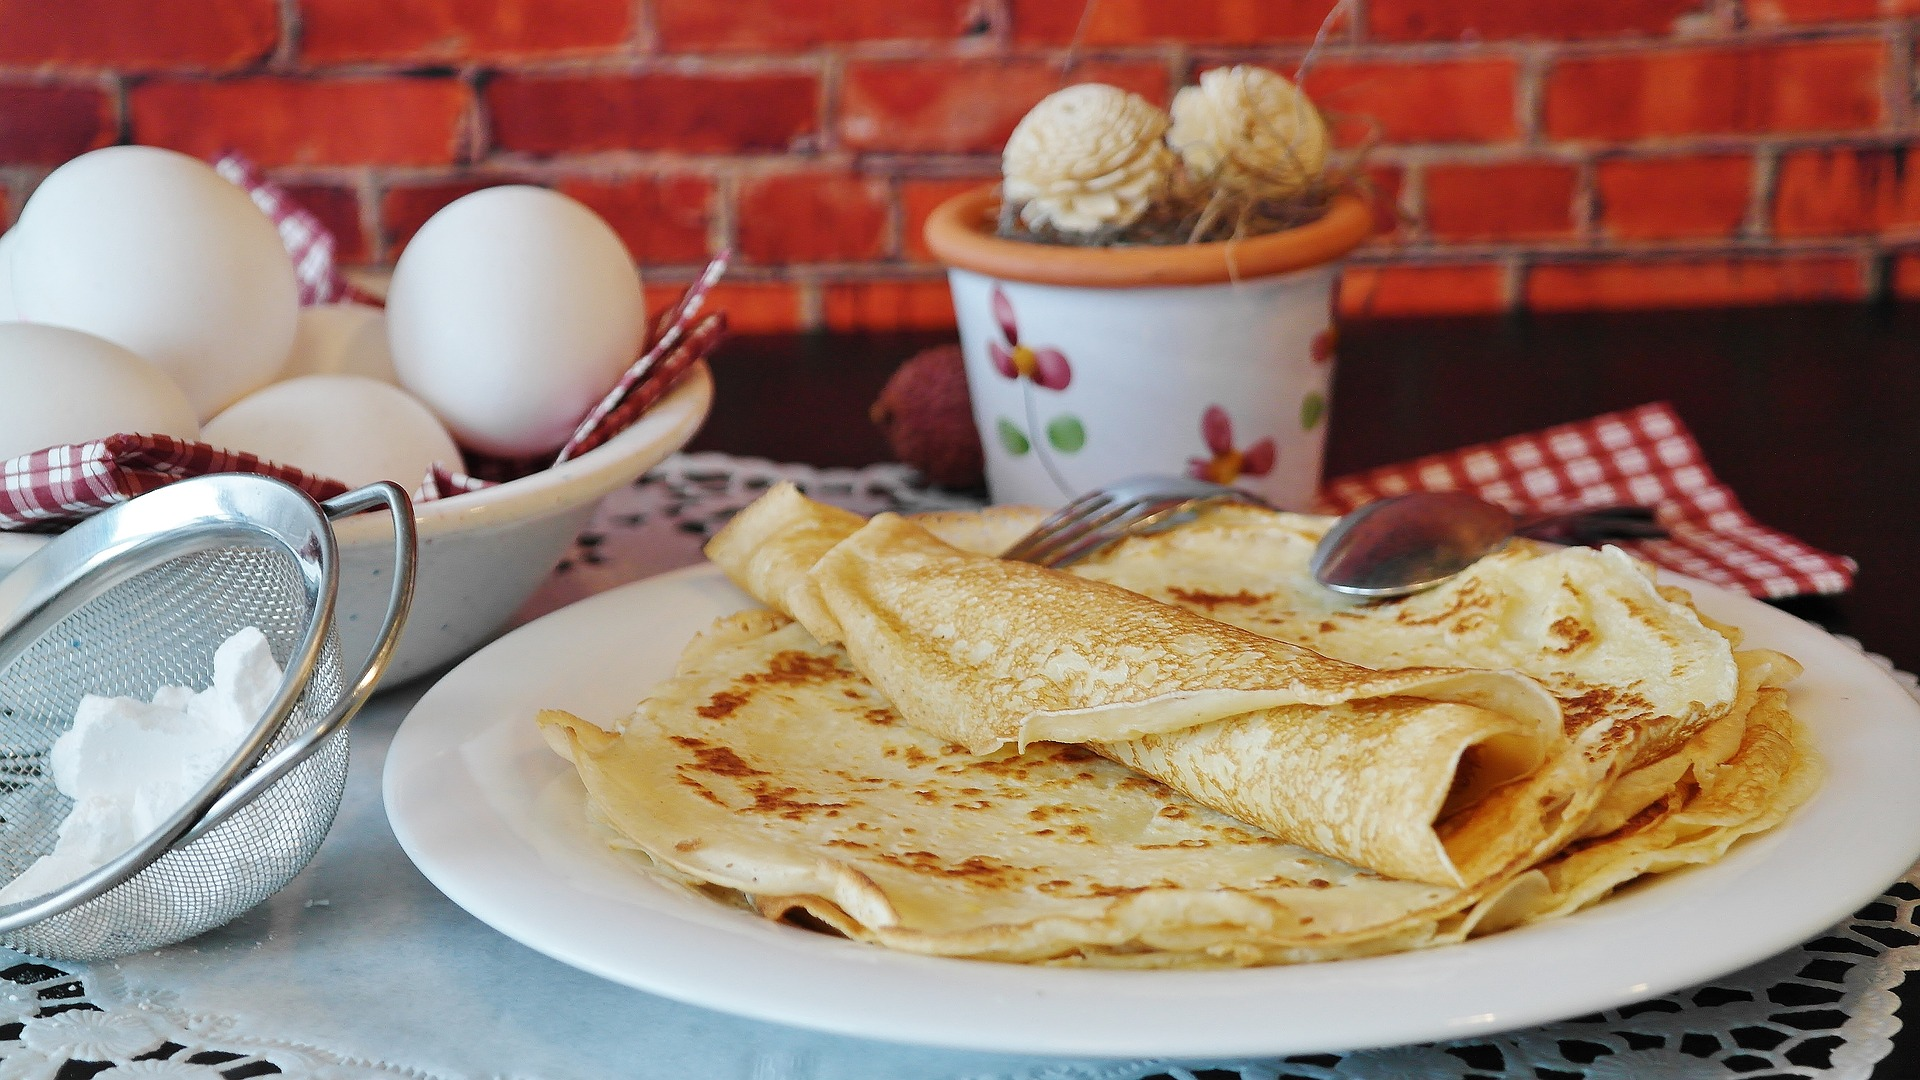 Godminster Cheesy Pancakes